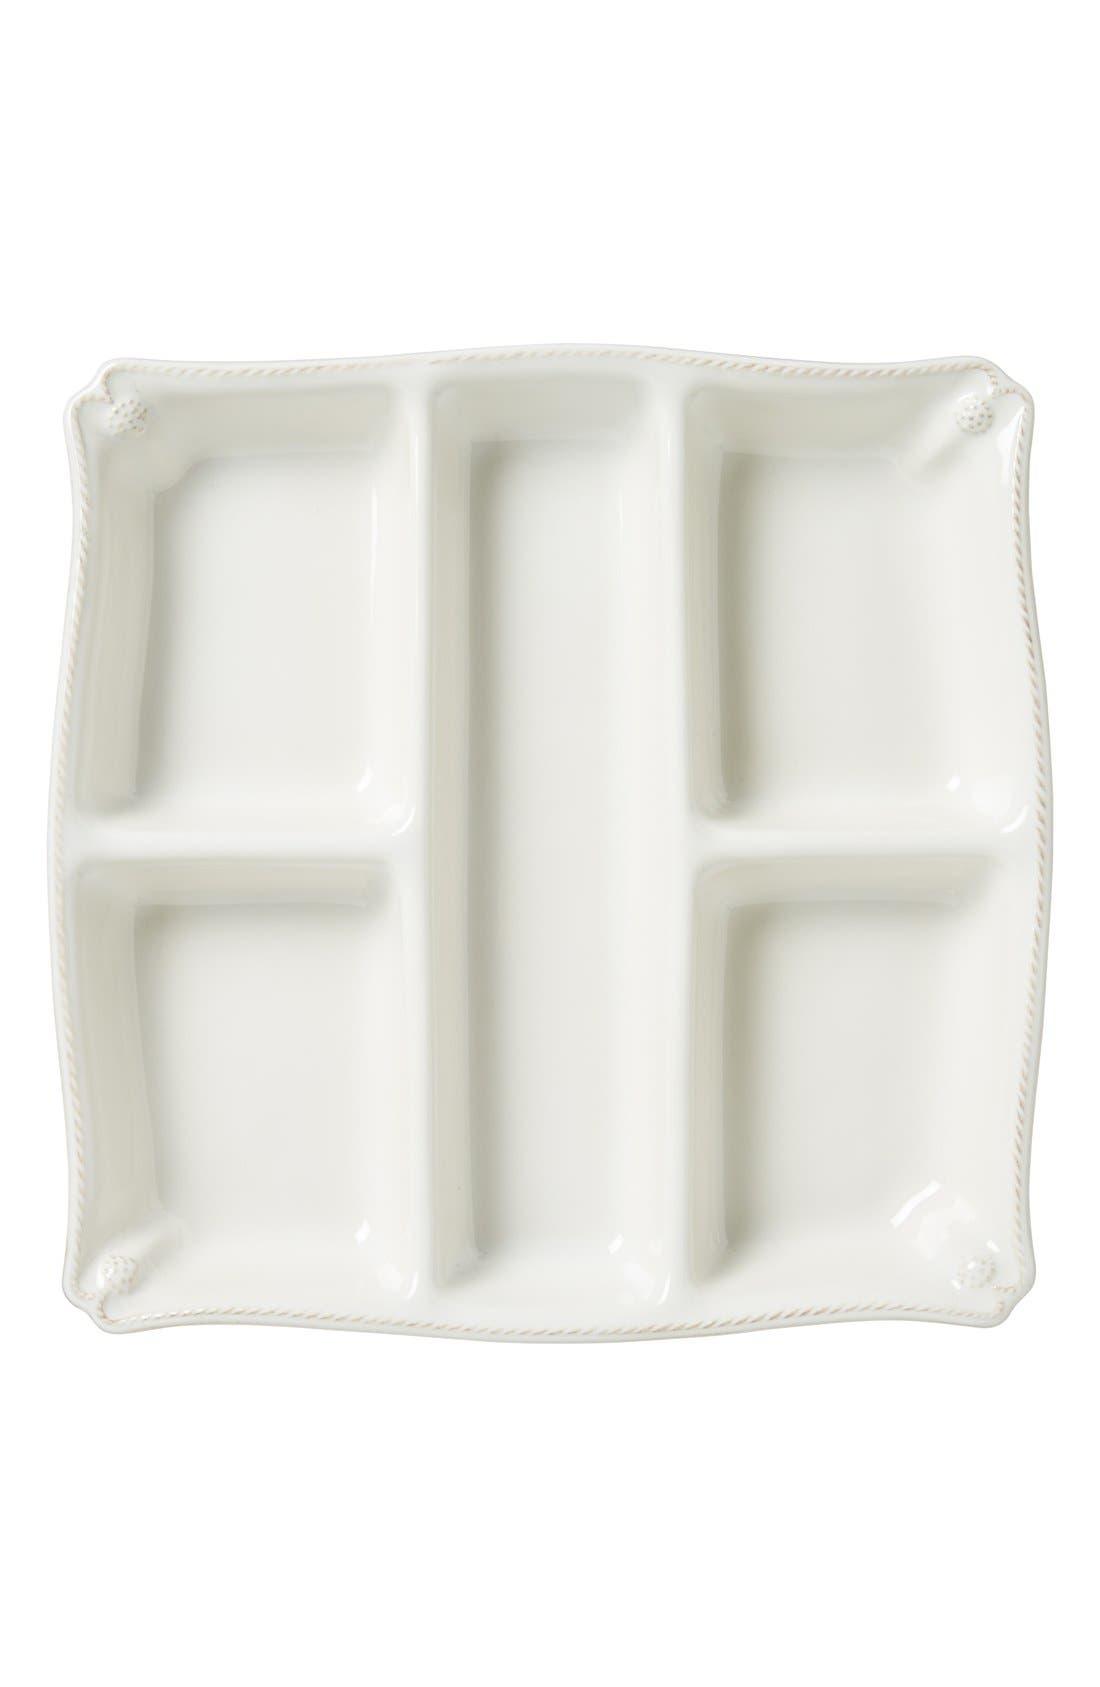 JULISKA, 'Berry and Thread' Ceramic Appetizer Platter, Main thumbnail 1, color, WHITEWASH